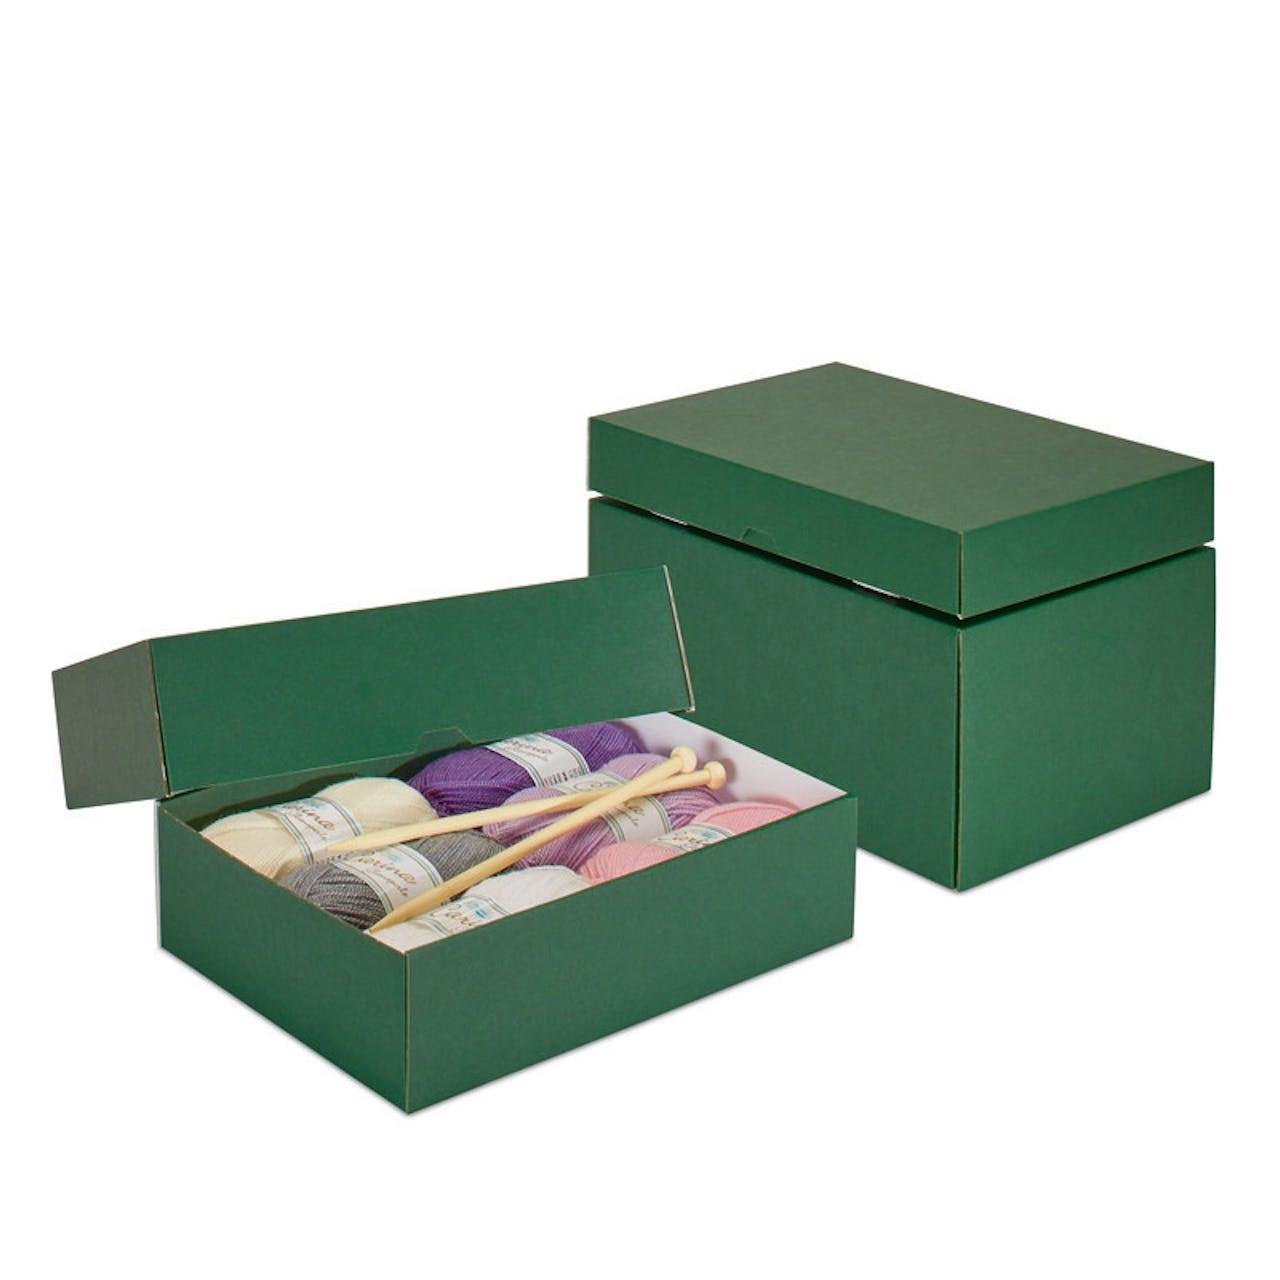 Stülpdeckelkarton dunkelgrün, VAR: 194-45